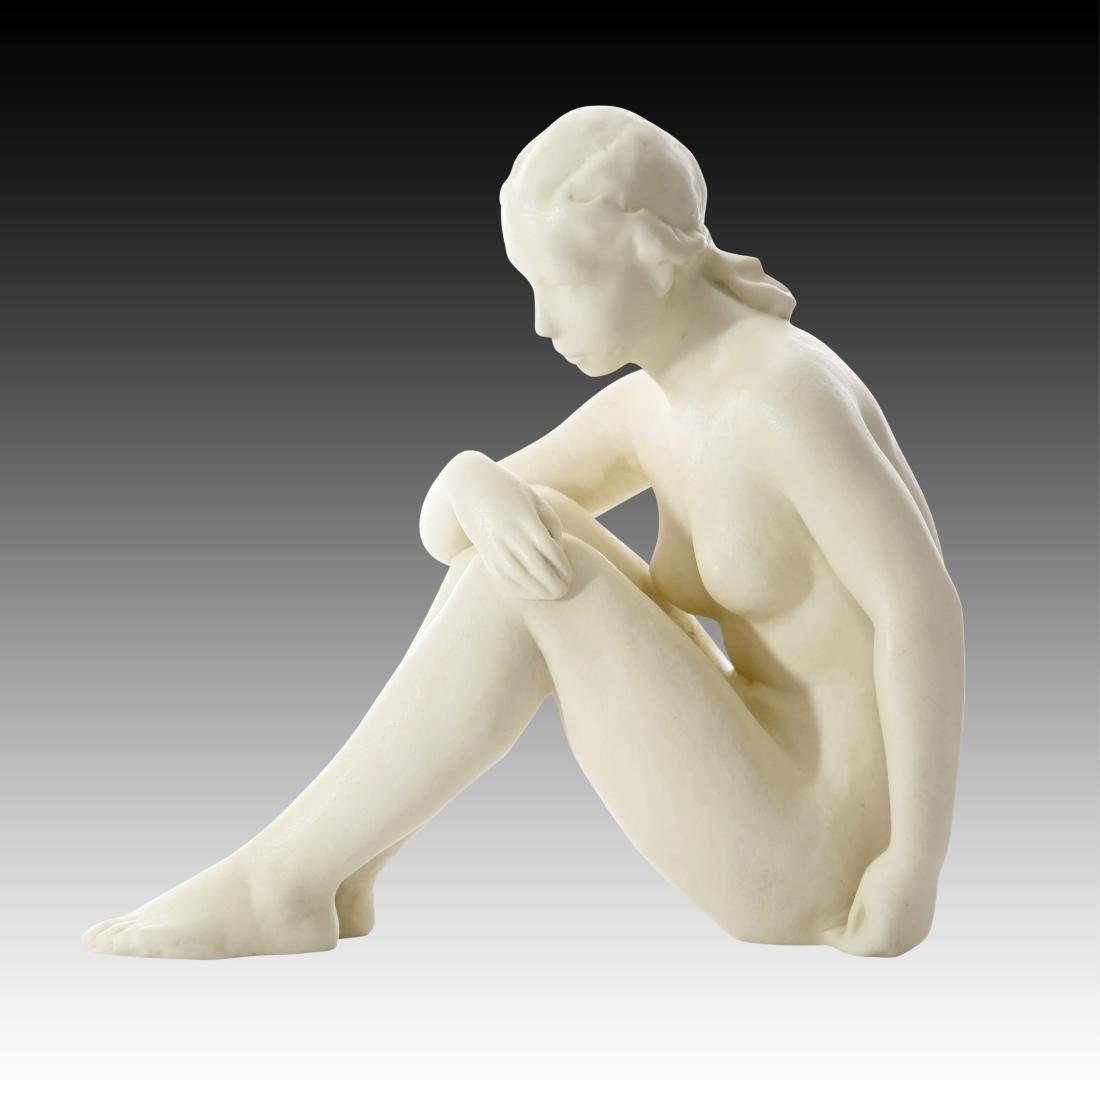 Rosenthal Nude Female Bisque Finish Figurine - 3